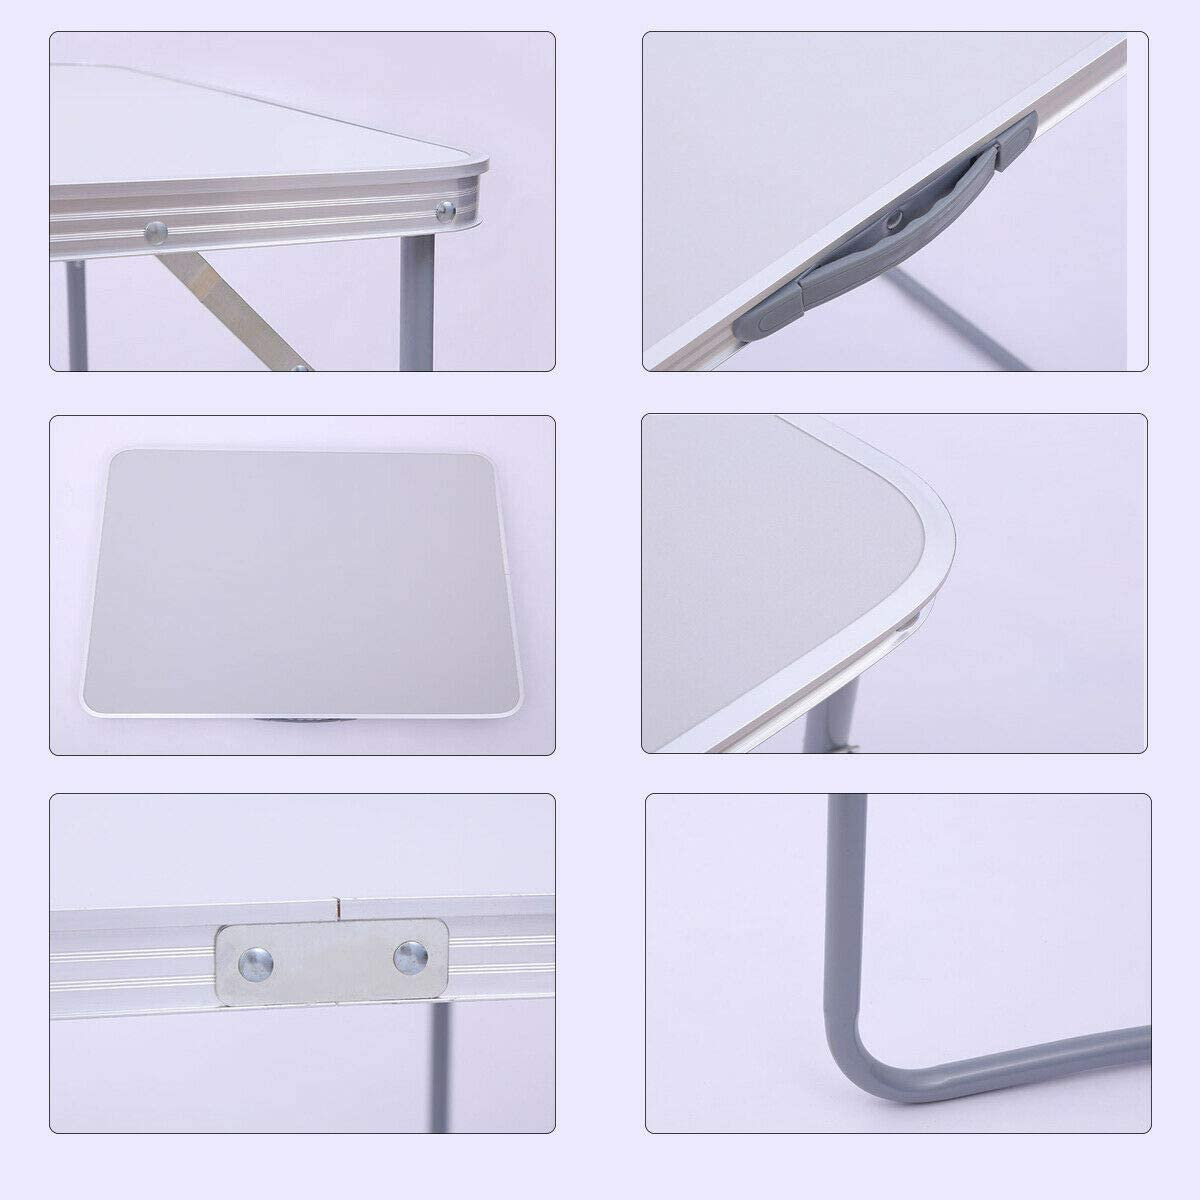 Lumiereholic Folding Table Picnic Table Garden Table Camping Table Adjustable Portable Folding Table White 80 x 60 x 70 cm